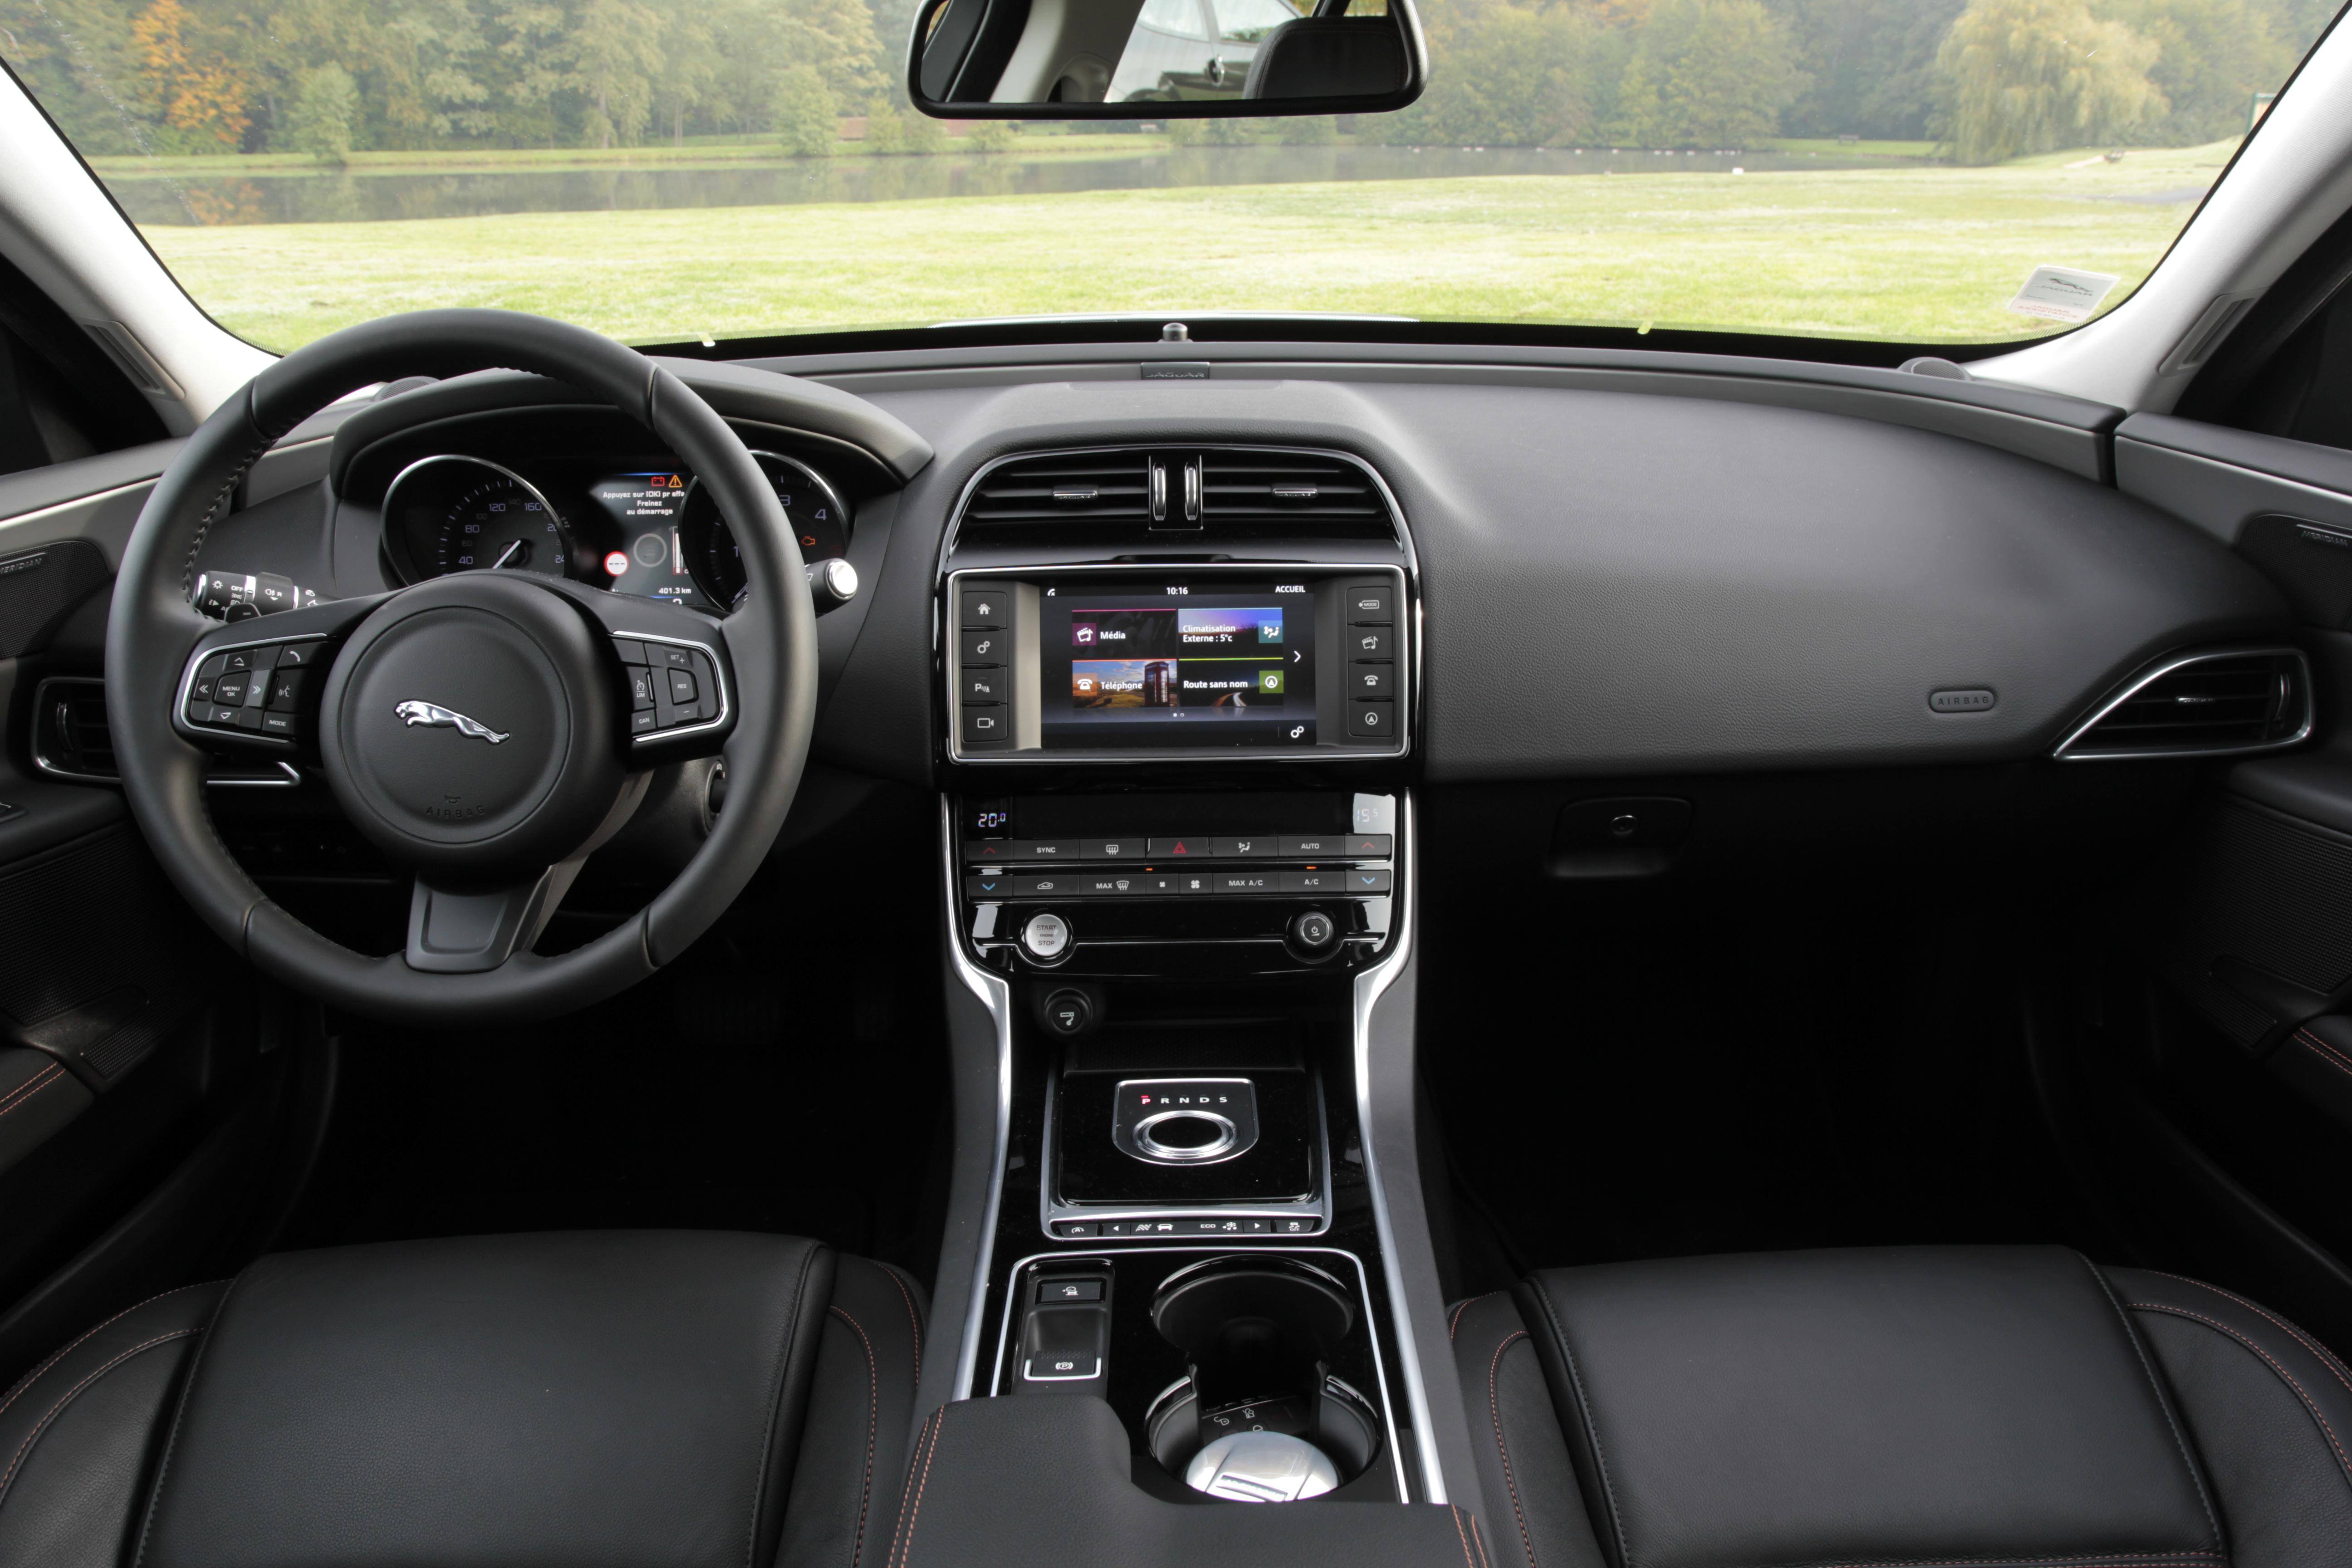 Comparatif vid o jaguar xe vs mercedes classe c for Interieur jaguar